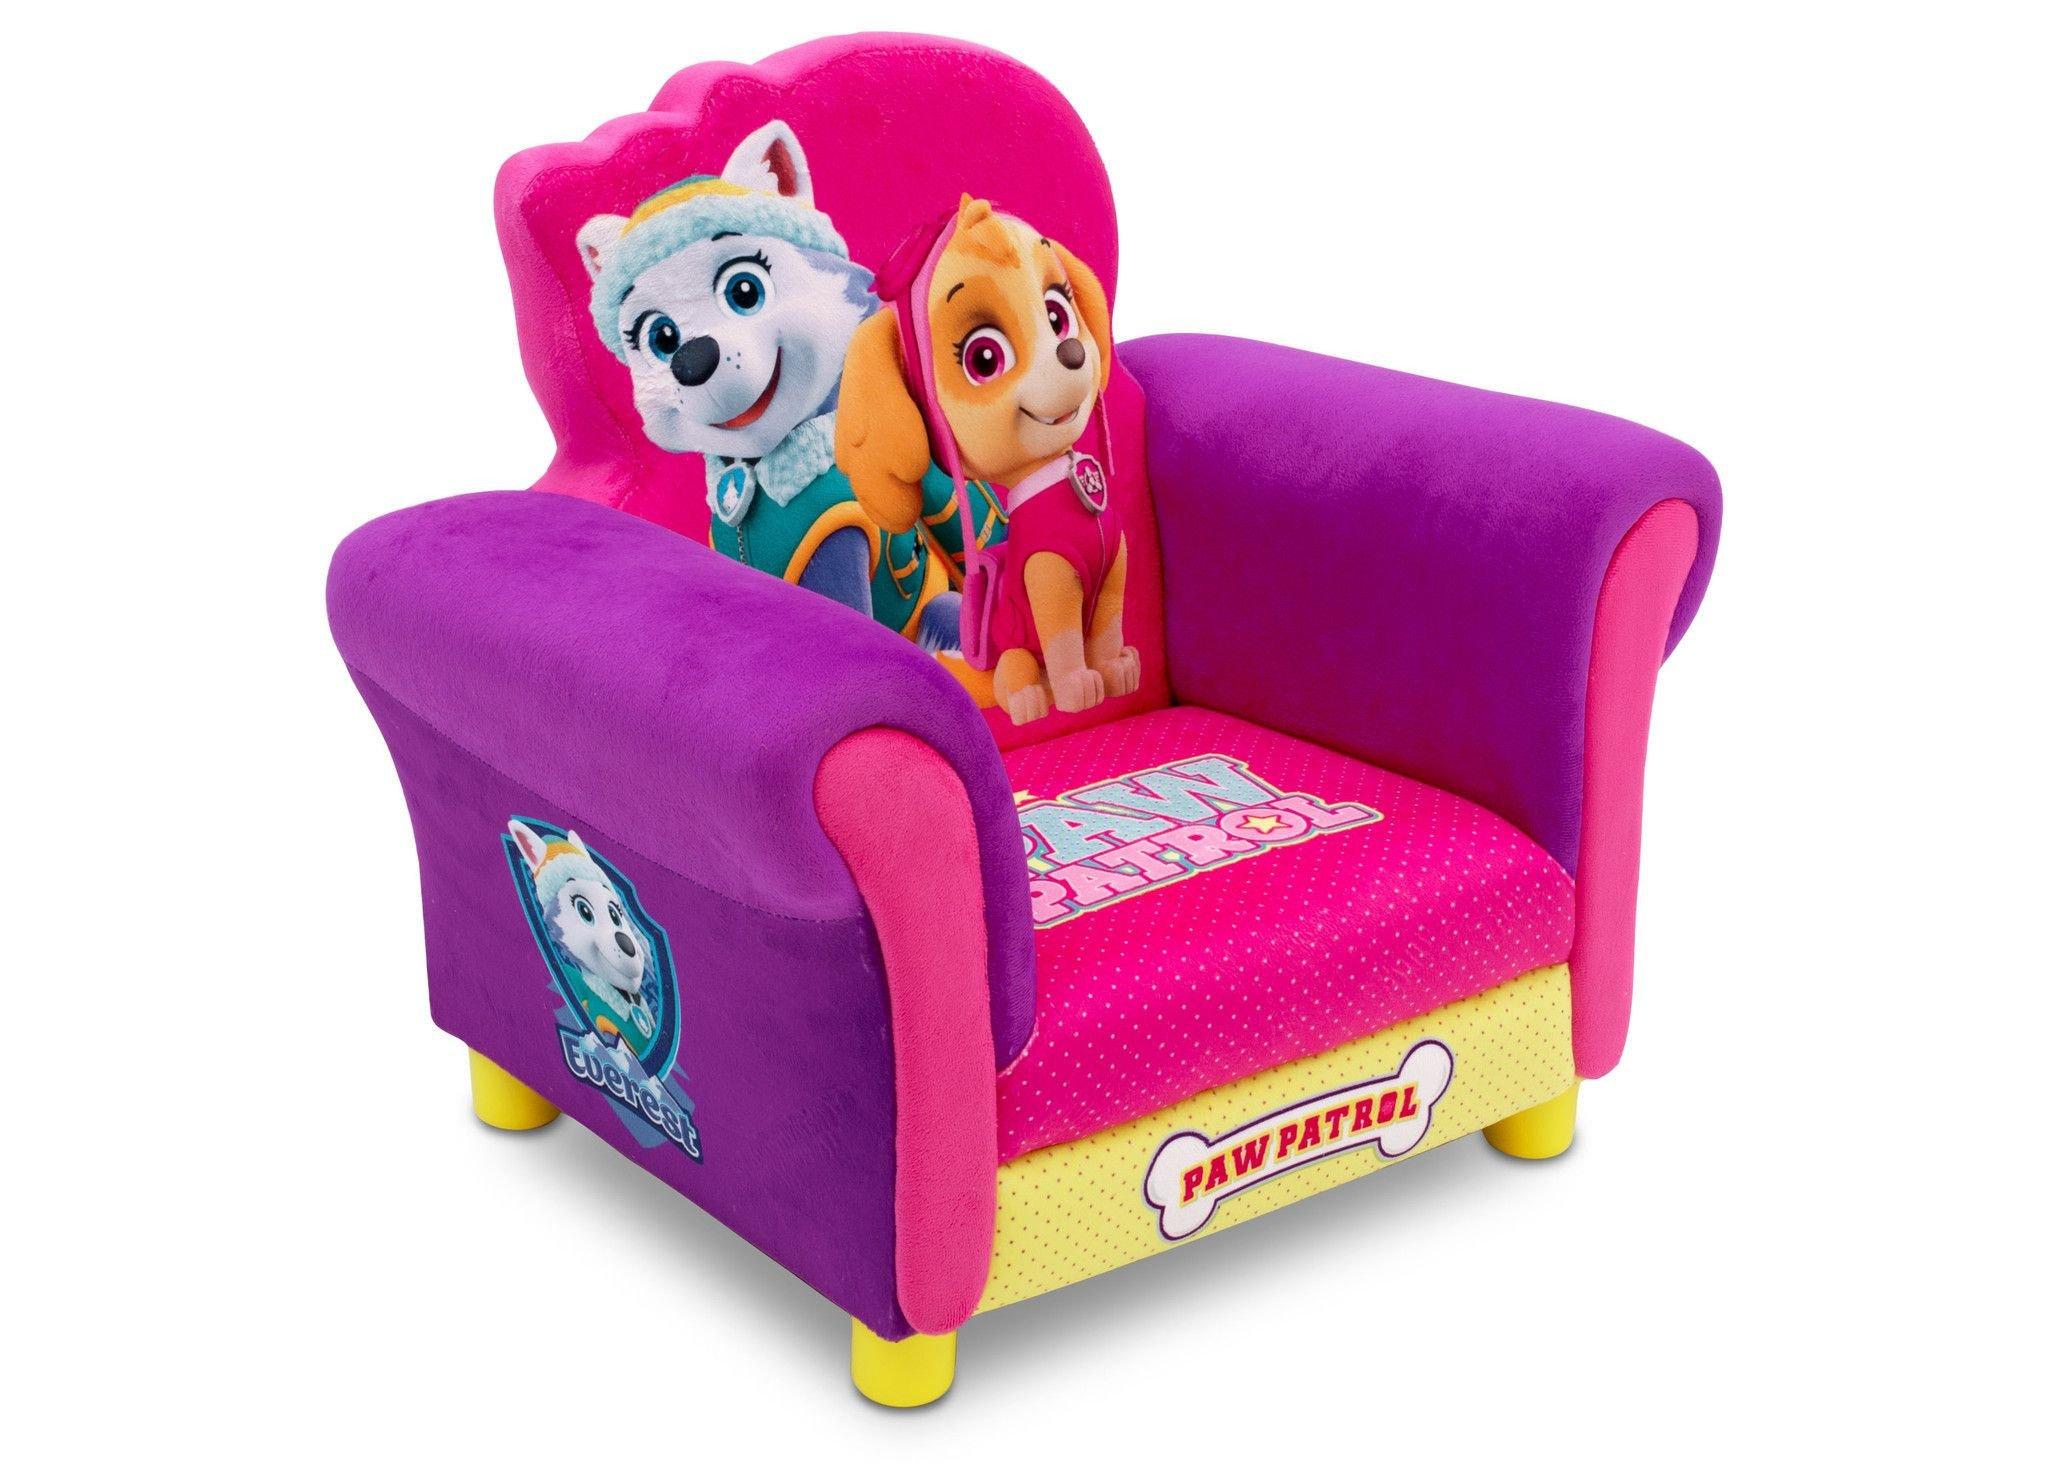 Paw Patrol Bedroom Decor Lovely Paw Patrol Skye & Everest Deluxe Upholstered Chair